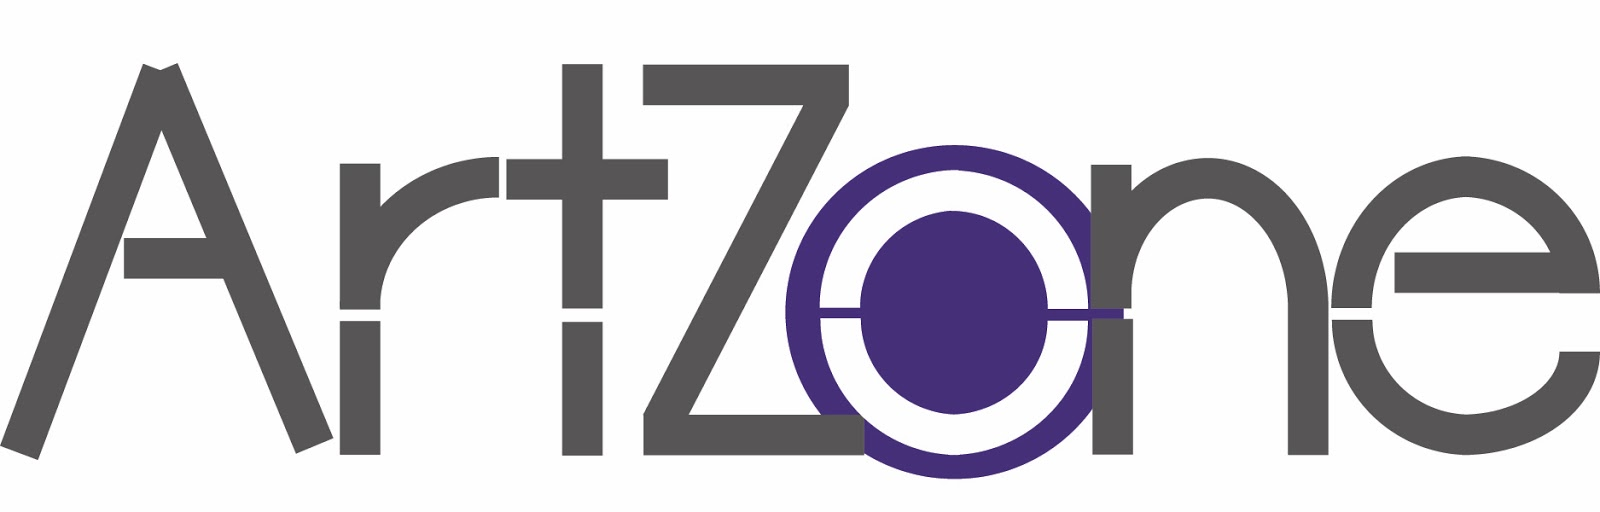 Art Zone unb art centre: artzone